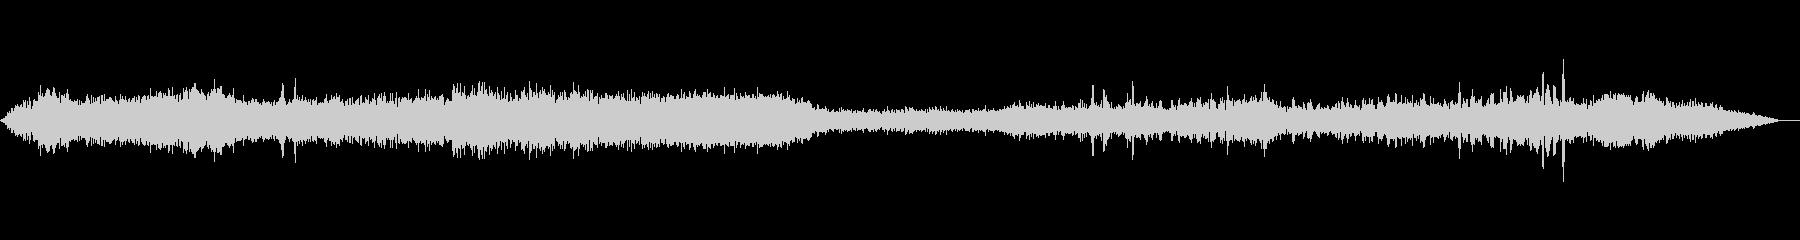 727:INT:着陸、音声、スチュ...の未再生の波形